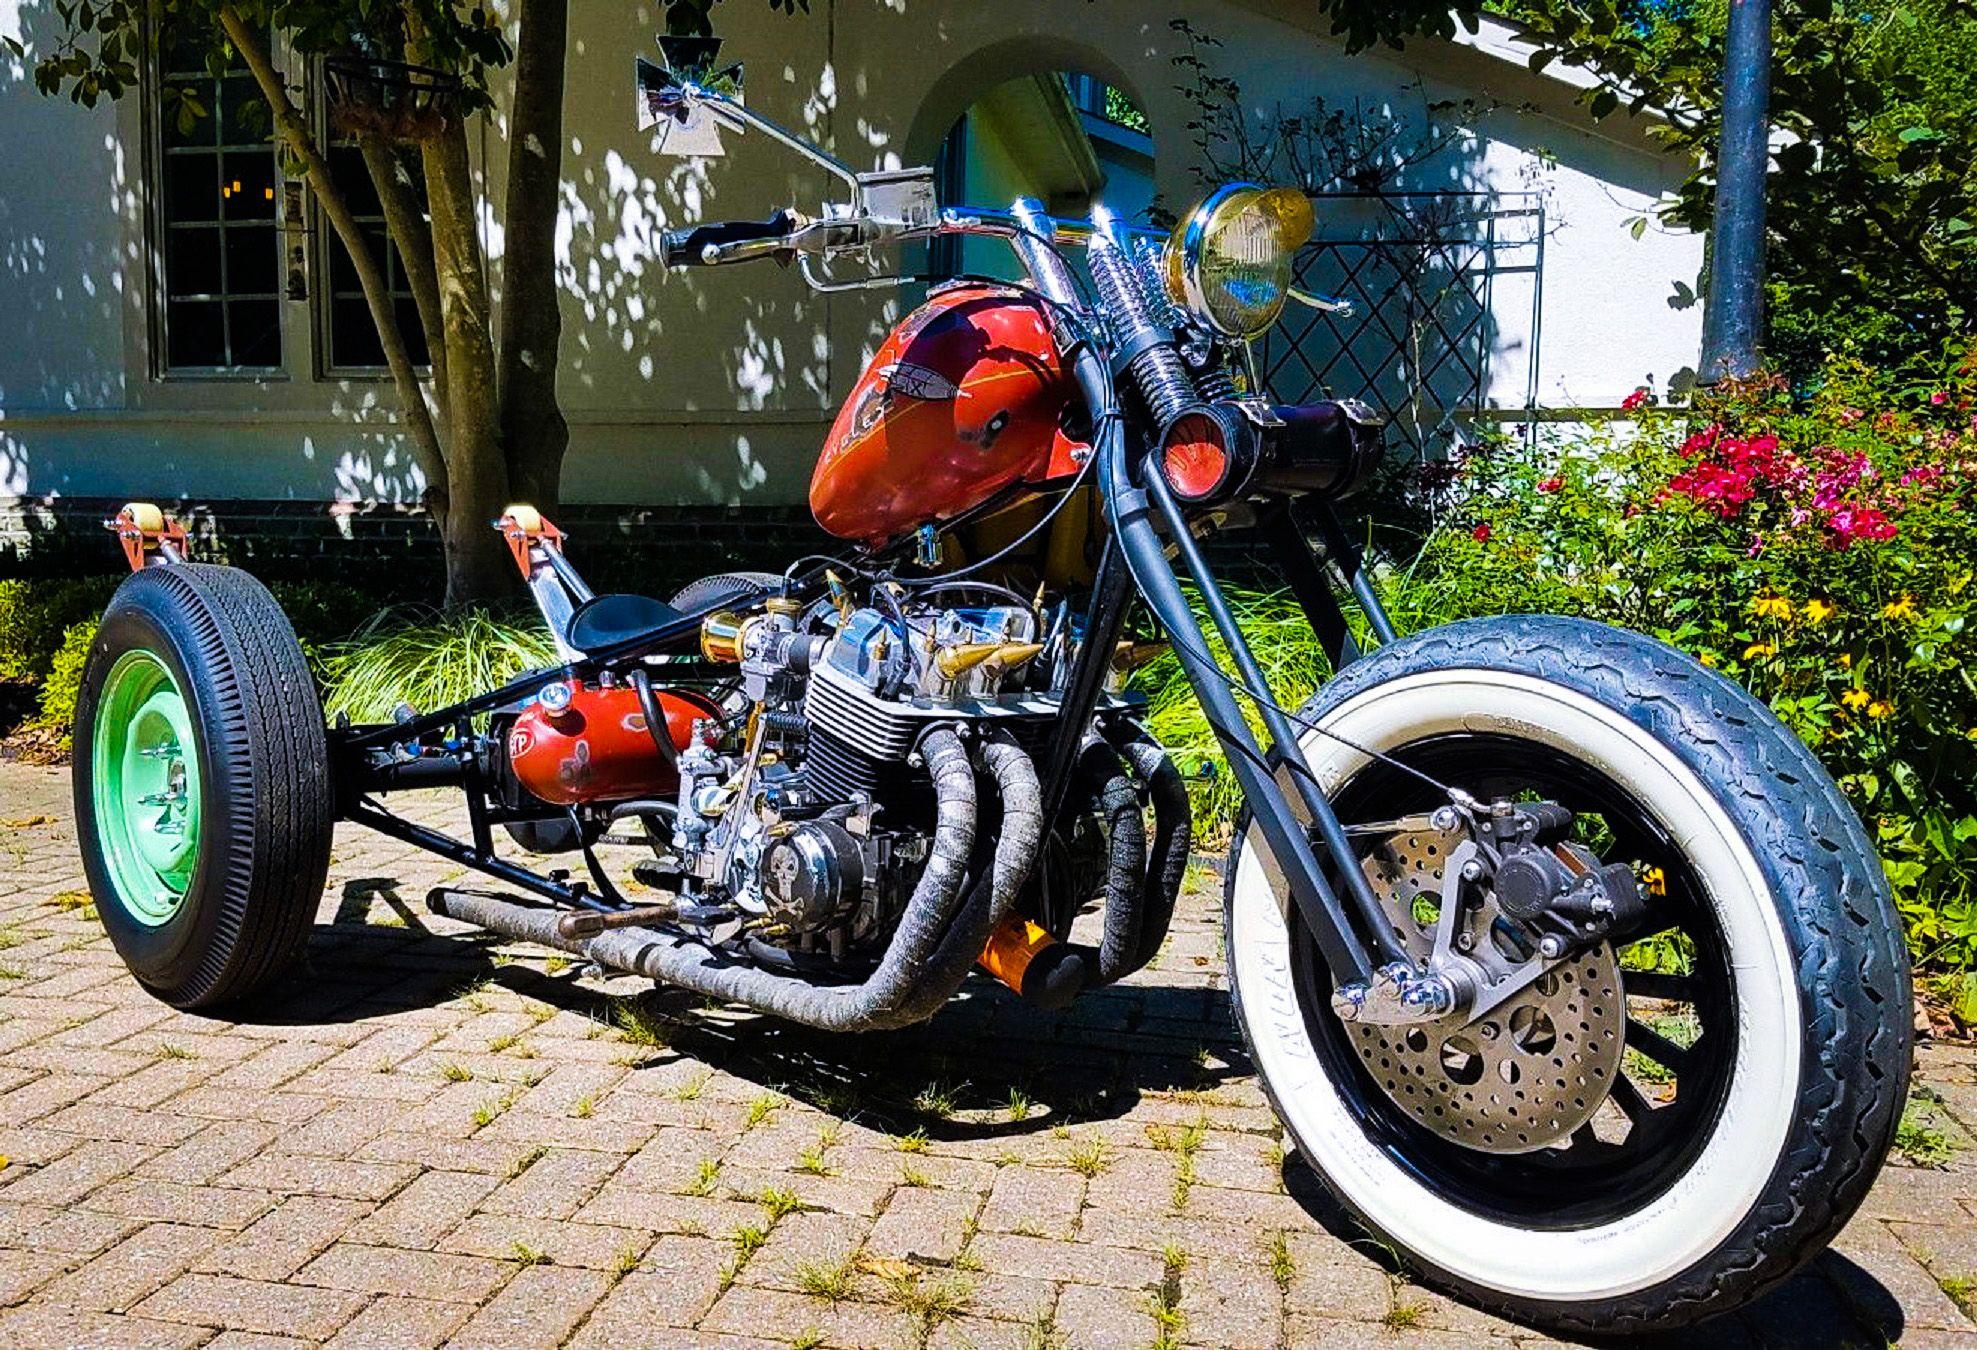 1976 honda cb750 chopper rat trike price 8750 or best